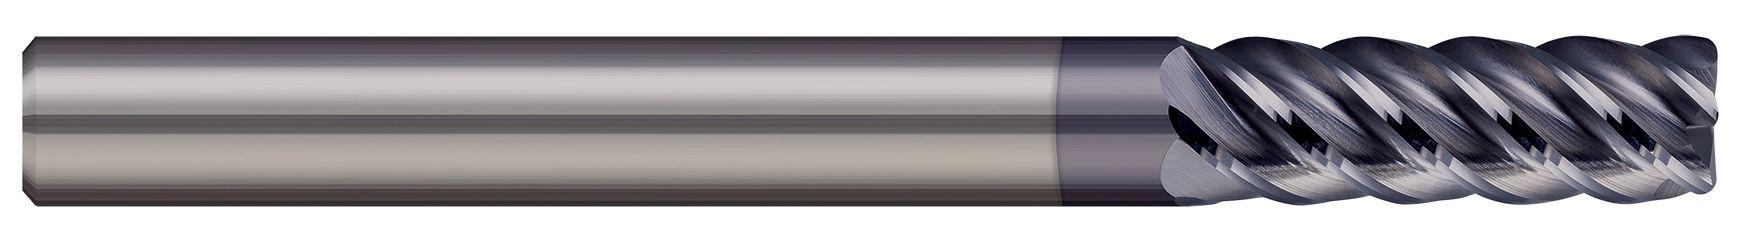 End Mills for Steels & High Temperature Alloys - Corner Radius - 5 Flute